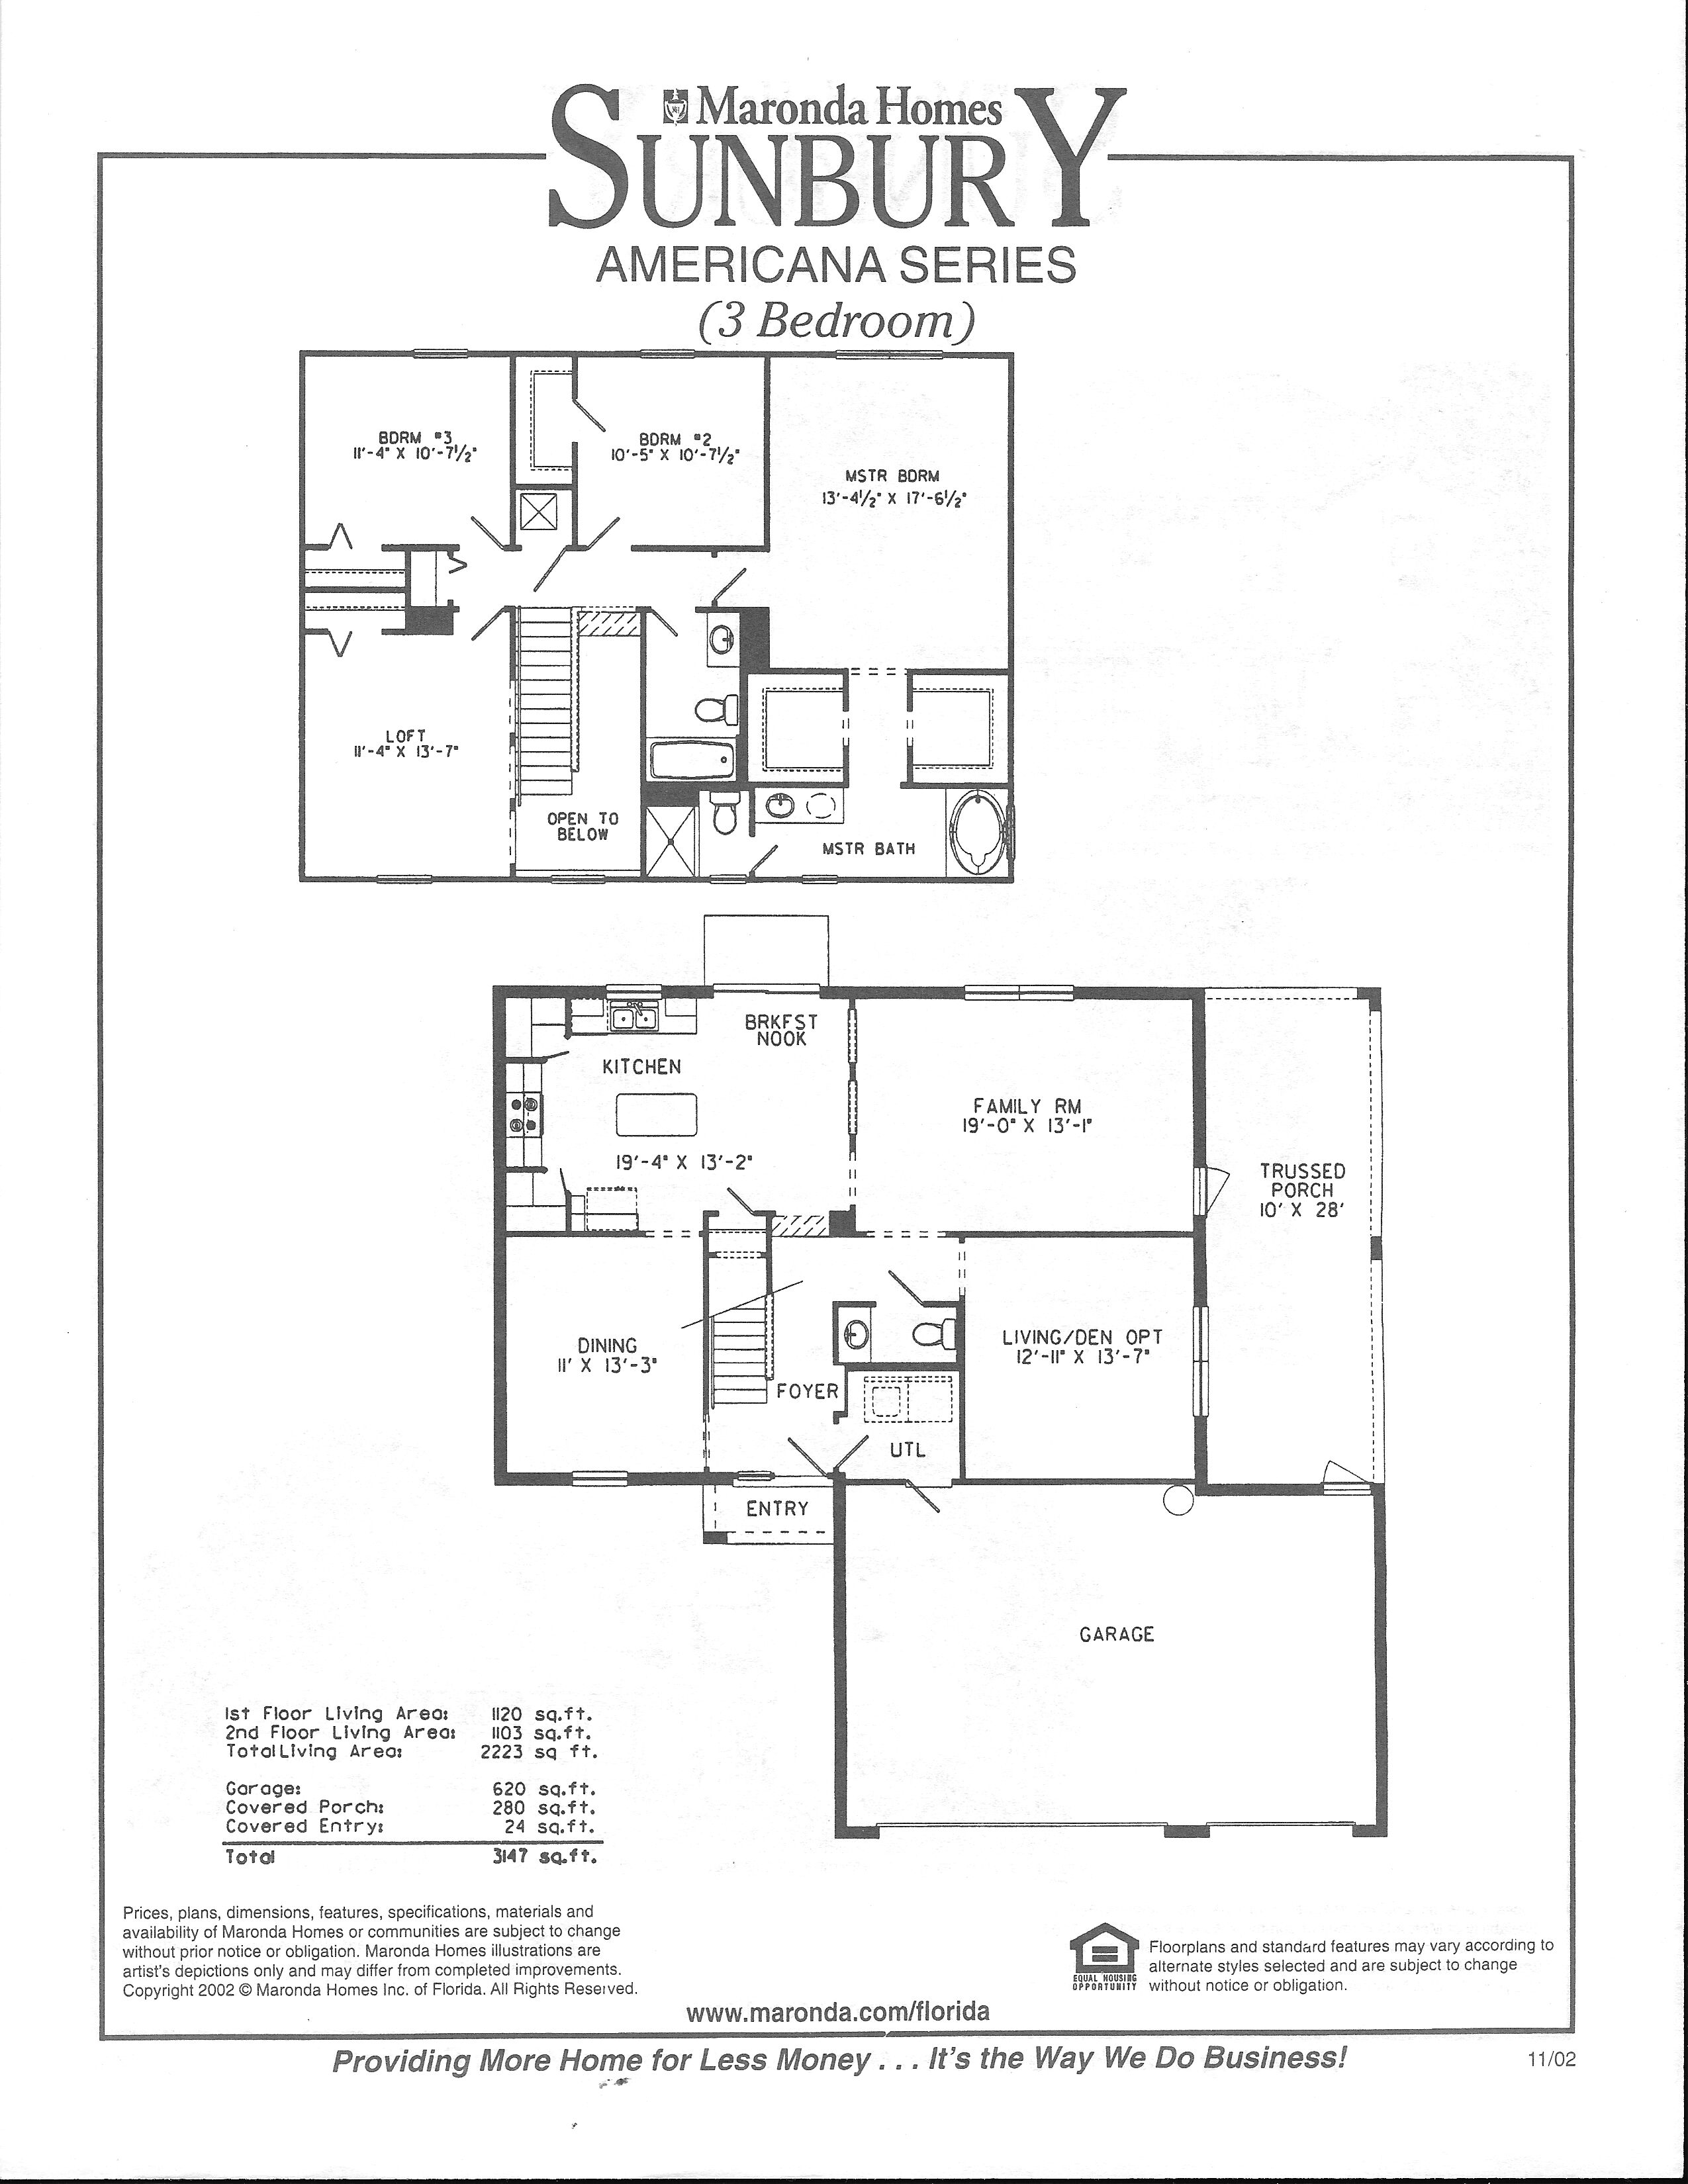 Maronda homes floor plans florida for Floor plans florida